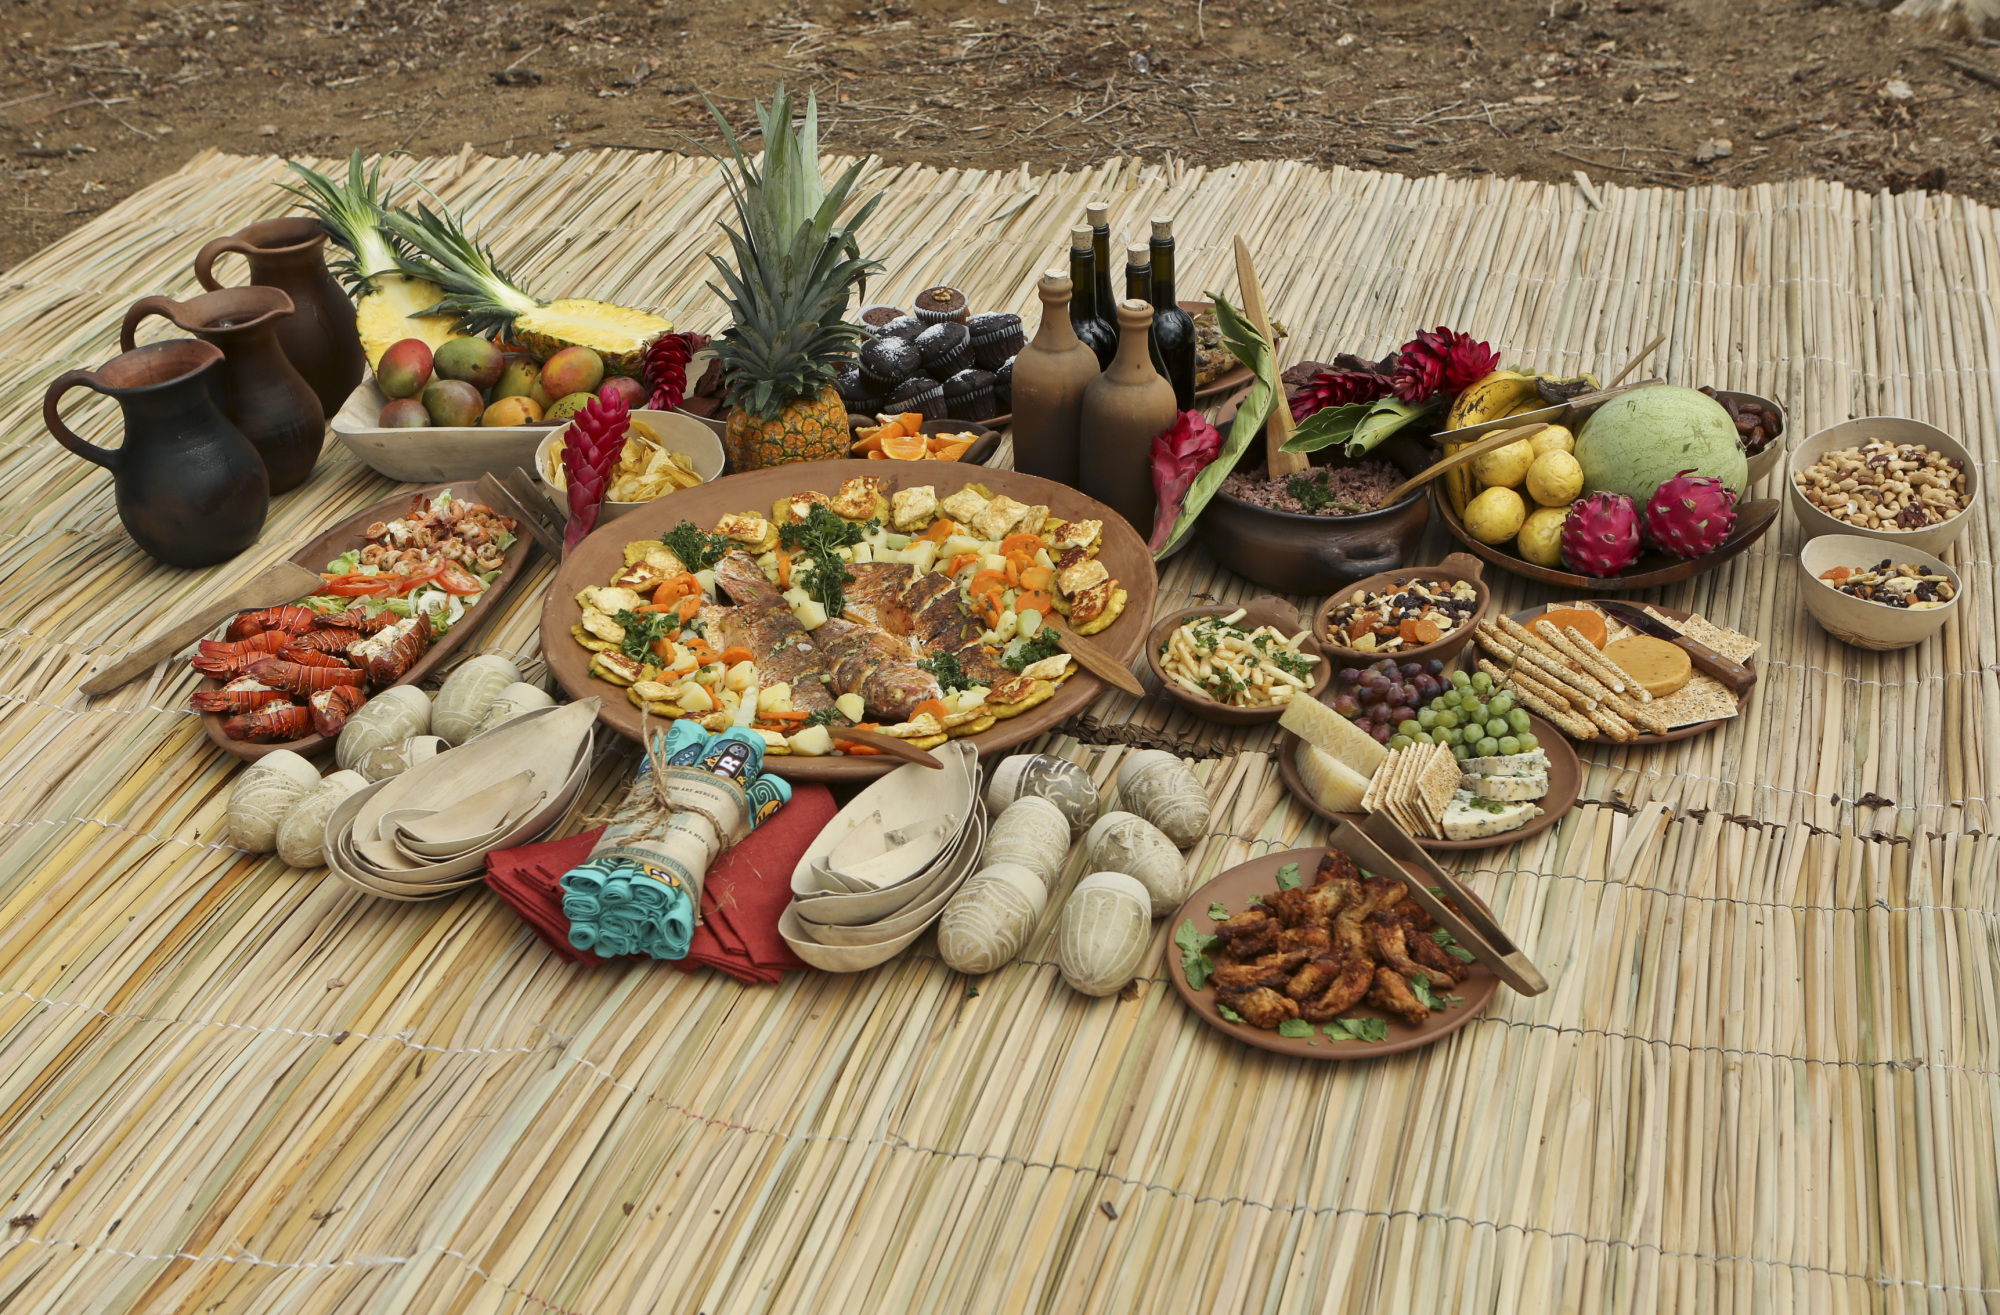 Delicious feast